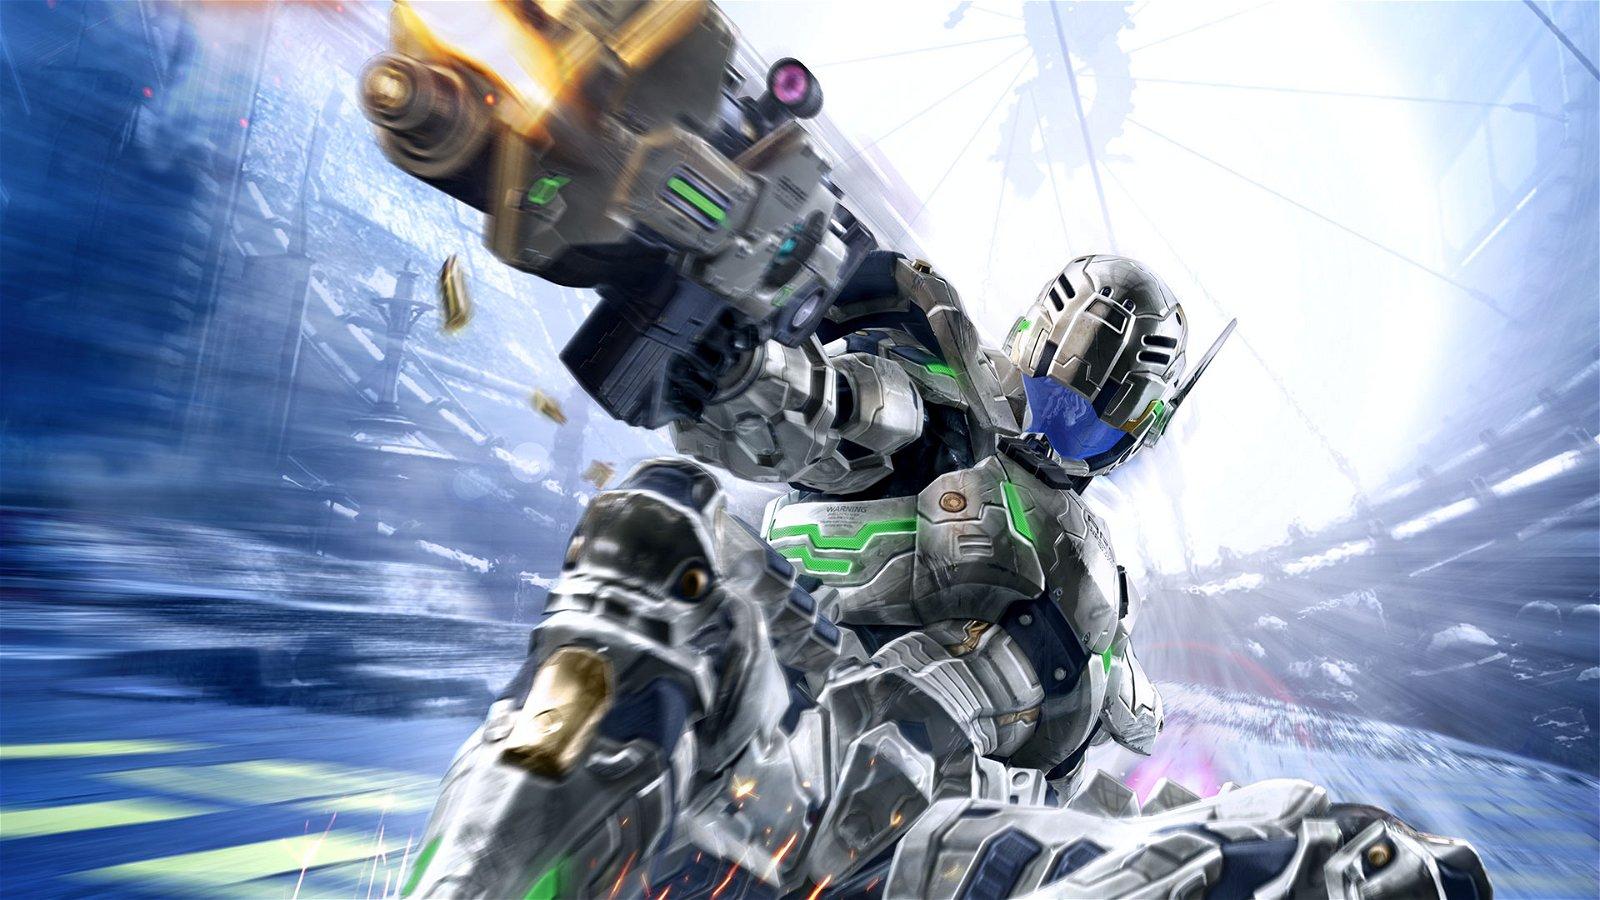 Vanquish Review - Fast Fast Blasts